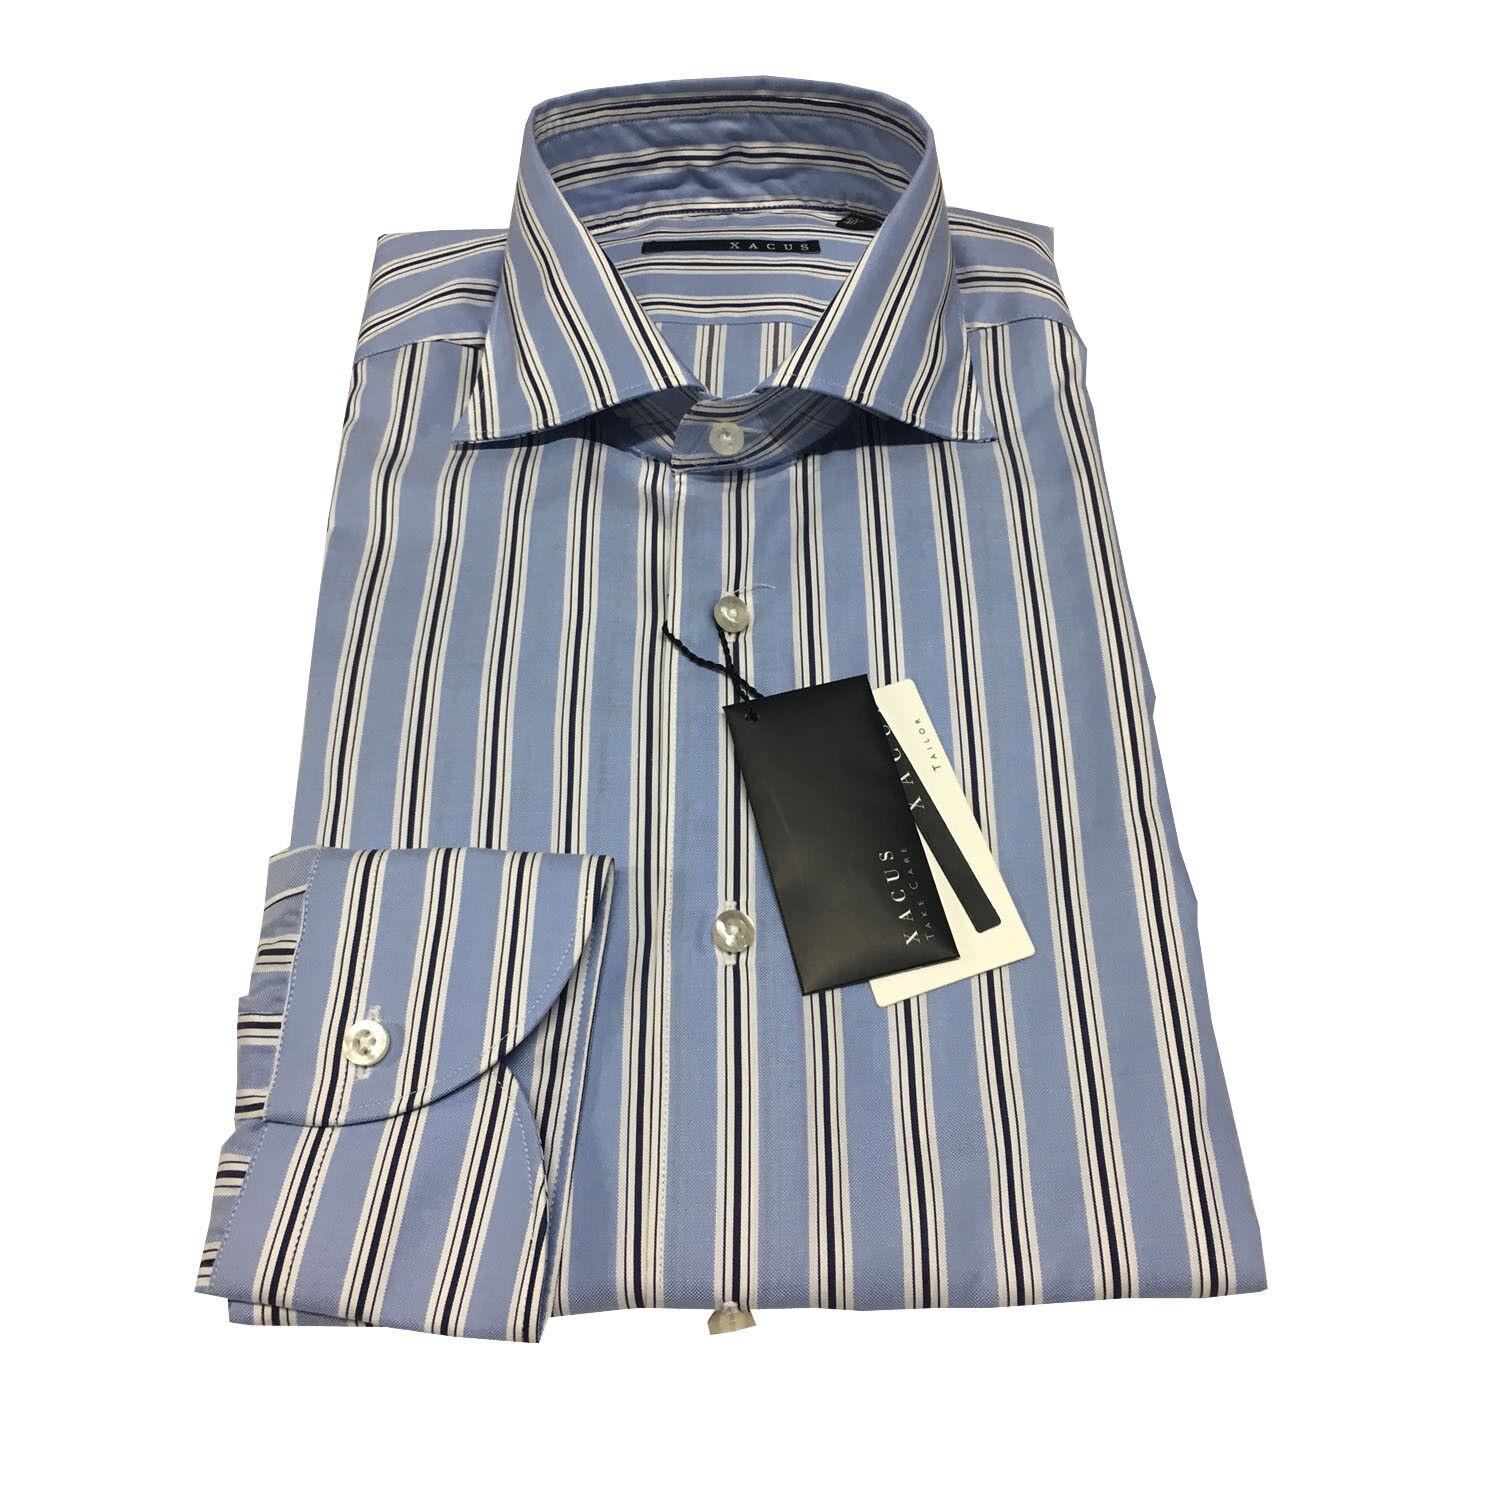 XACUS men's shirts striped baby bluee 100% cotton